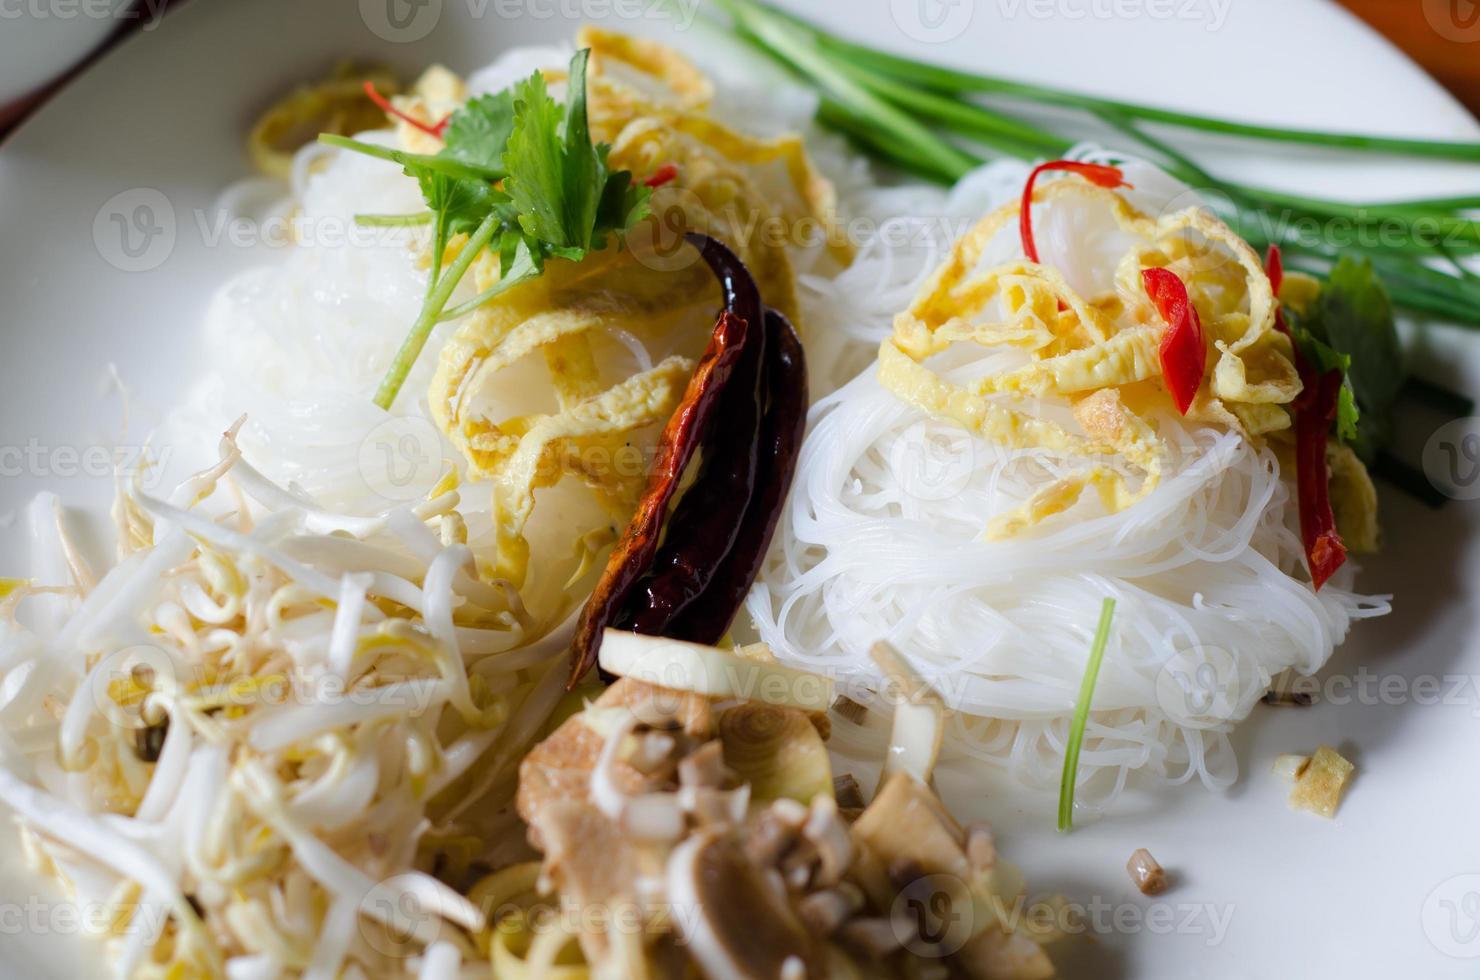 rijstnoedels in kokosmelk saus (mee kati) foto